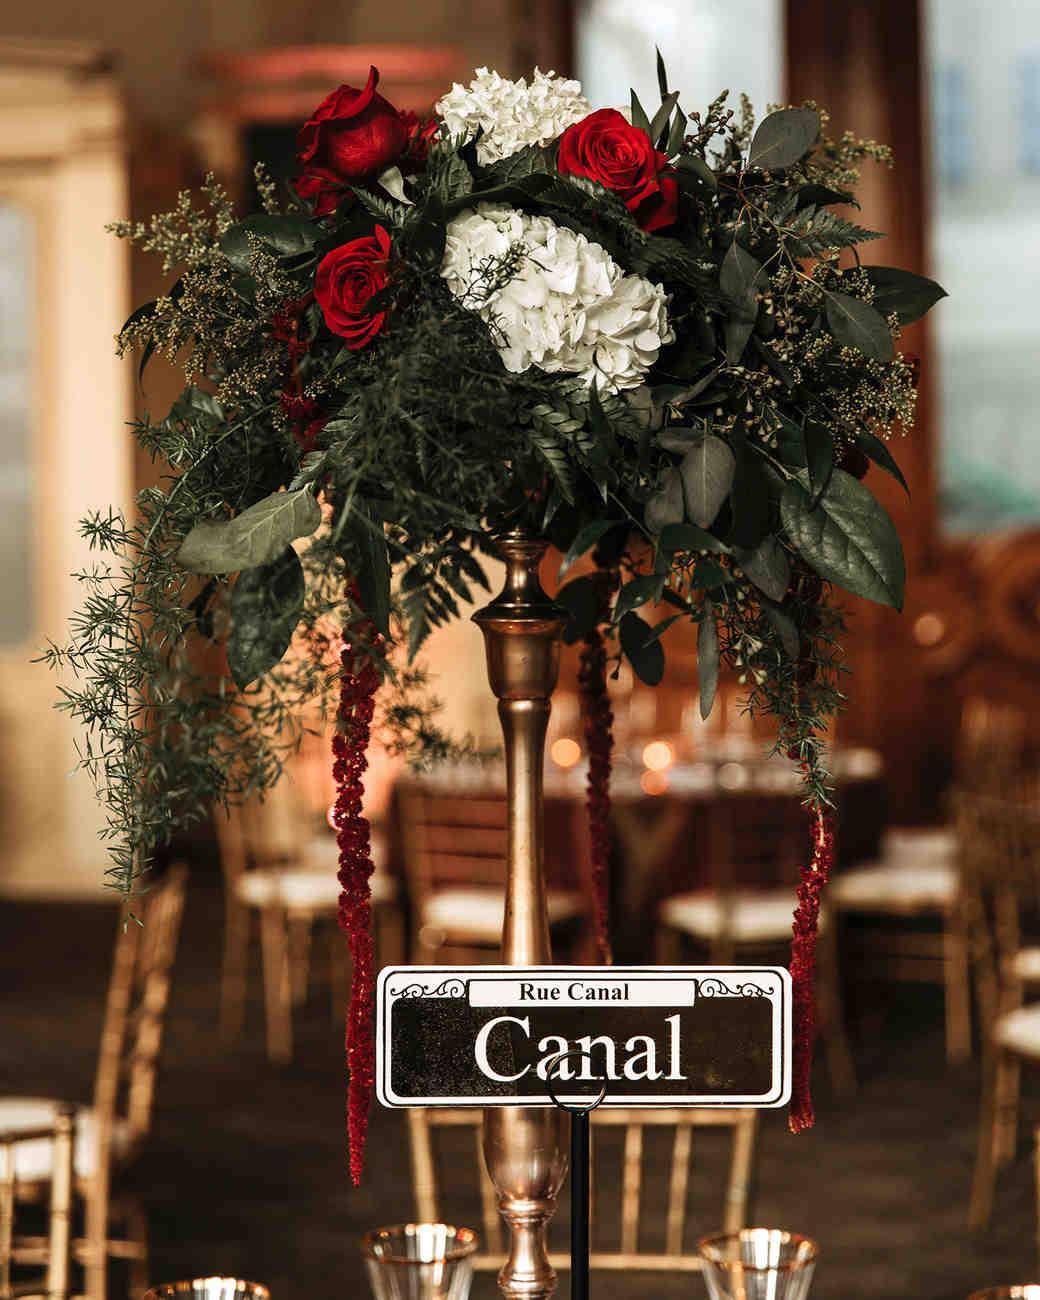 joe-tim-wedding-roses-centerpiece-1161-1018_vert.jpg